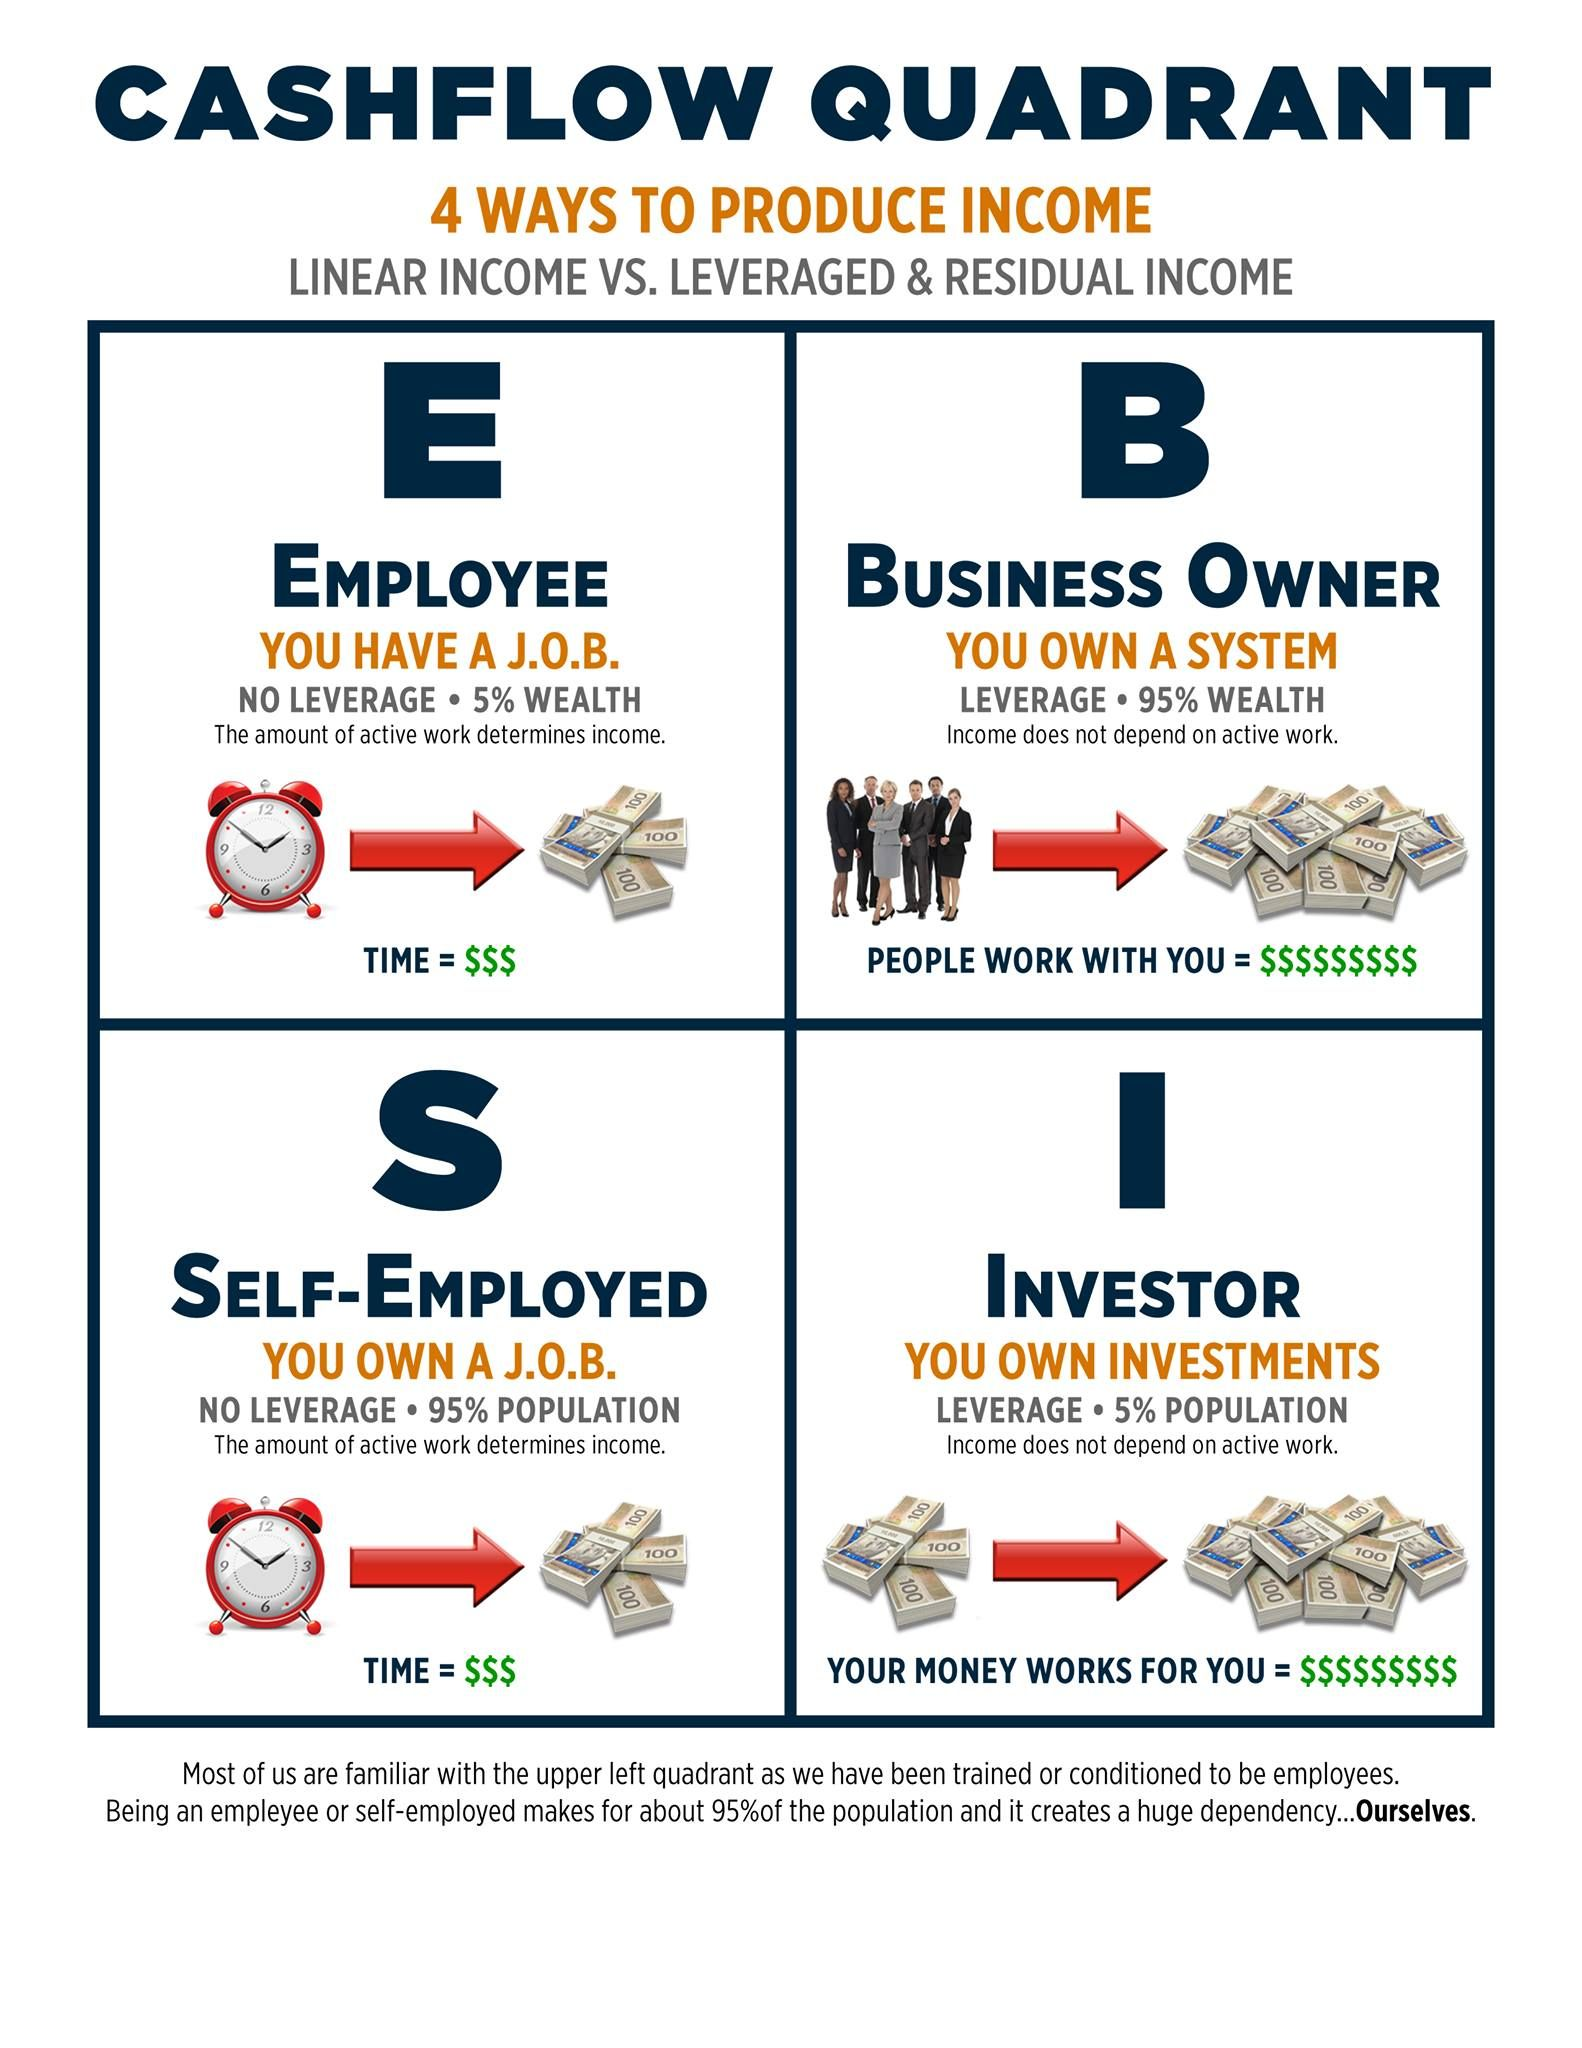 Cash Flow Quadrant 4 Ways To Produce Income Be Careful